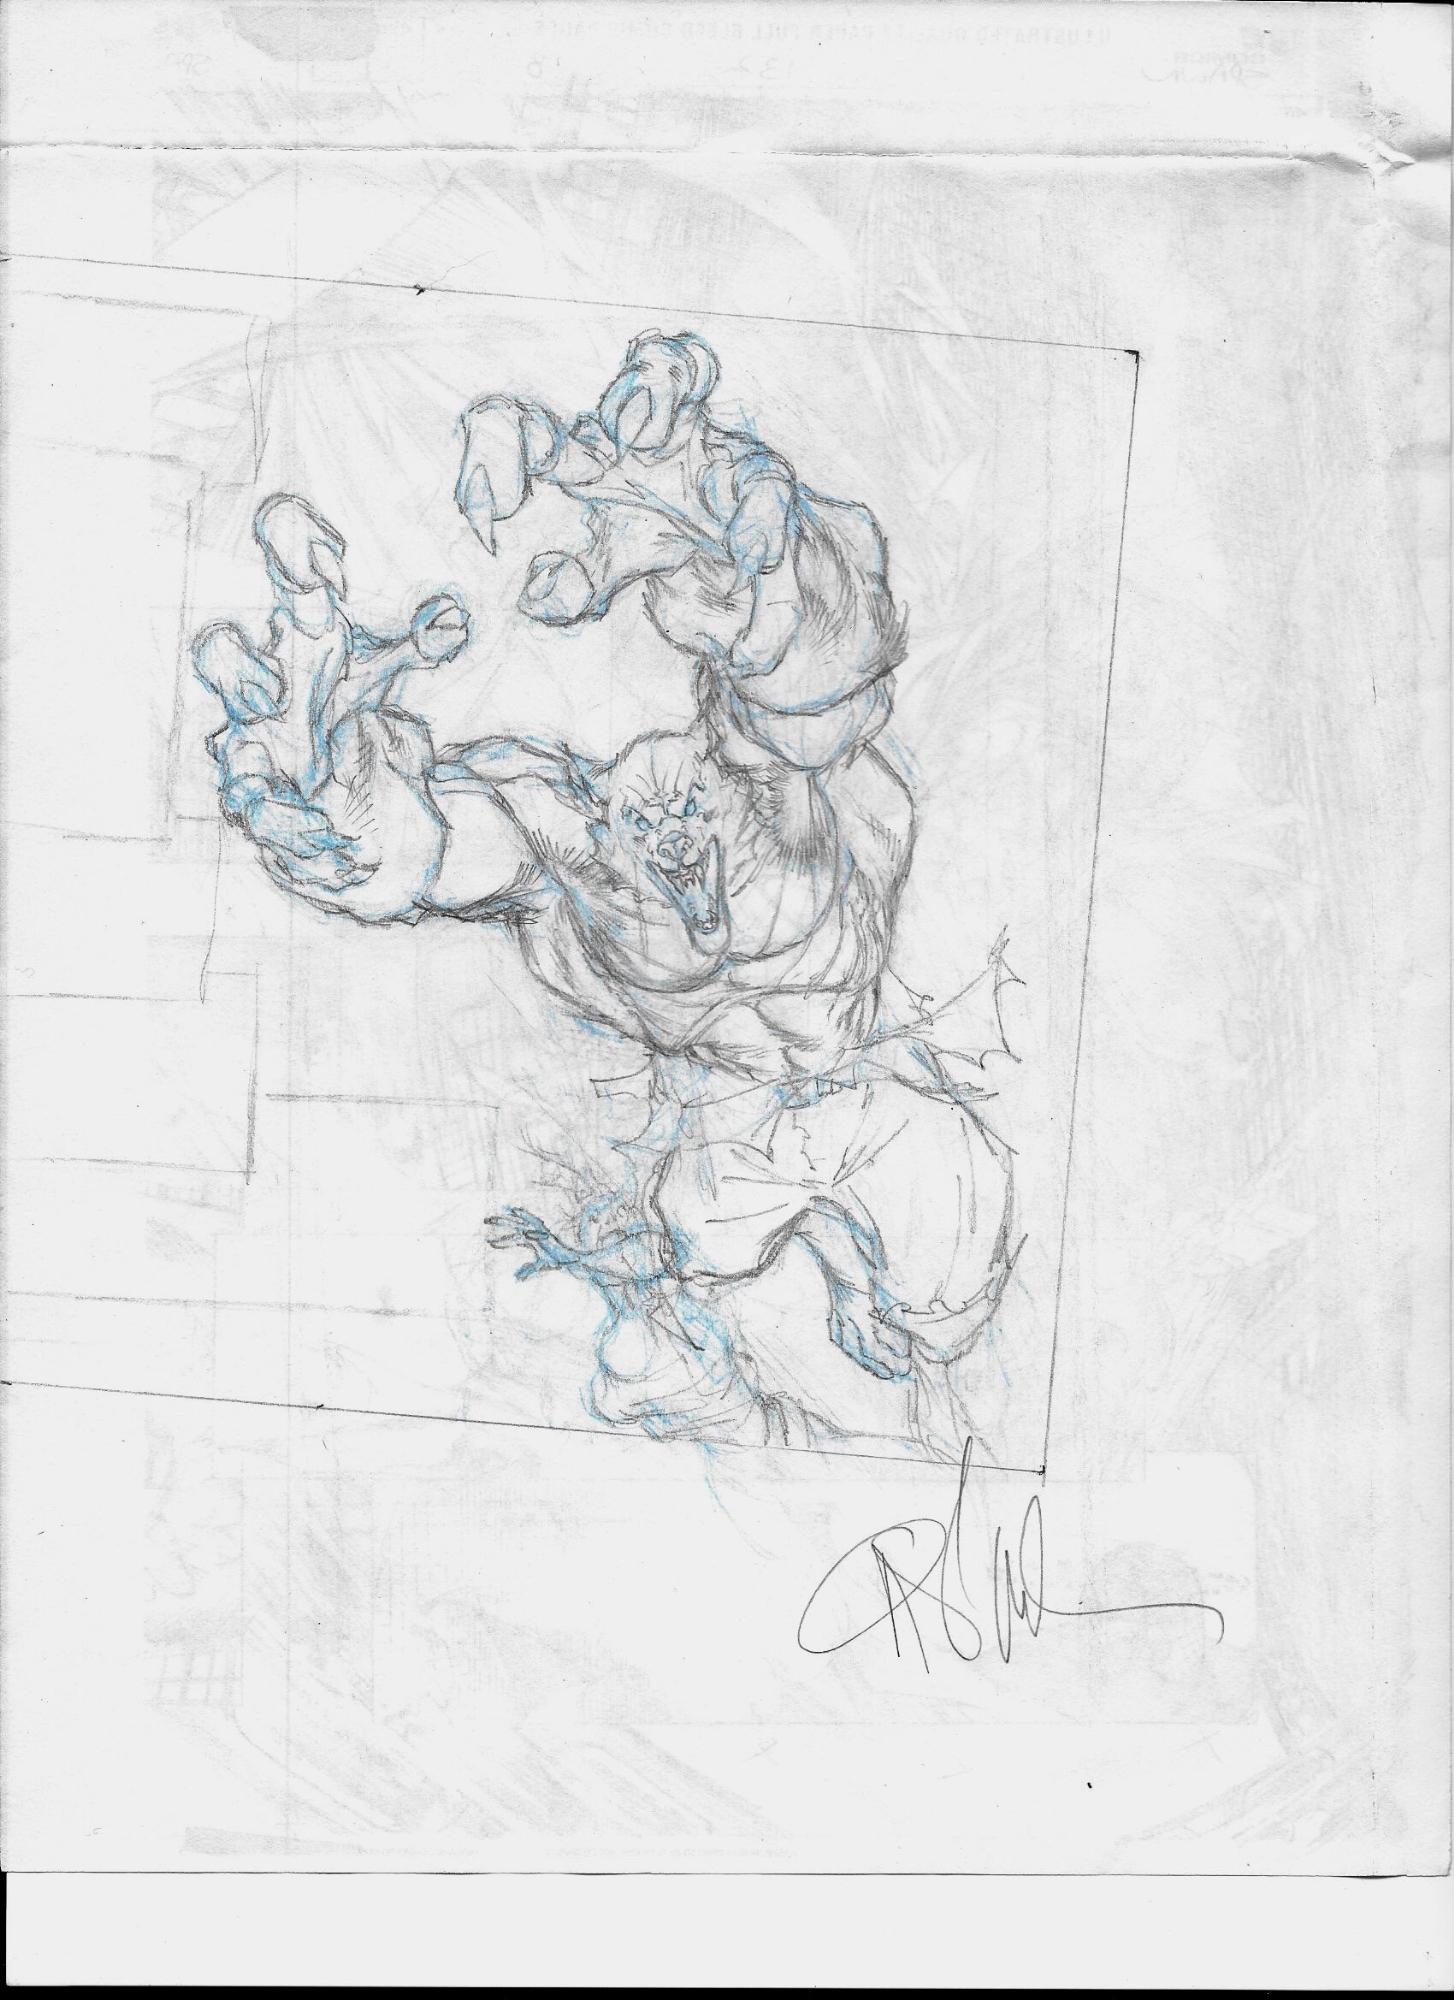 Man-Wolf vs Mary Jane (Spider-Man) prelim , in Erik Essington's For